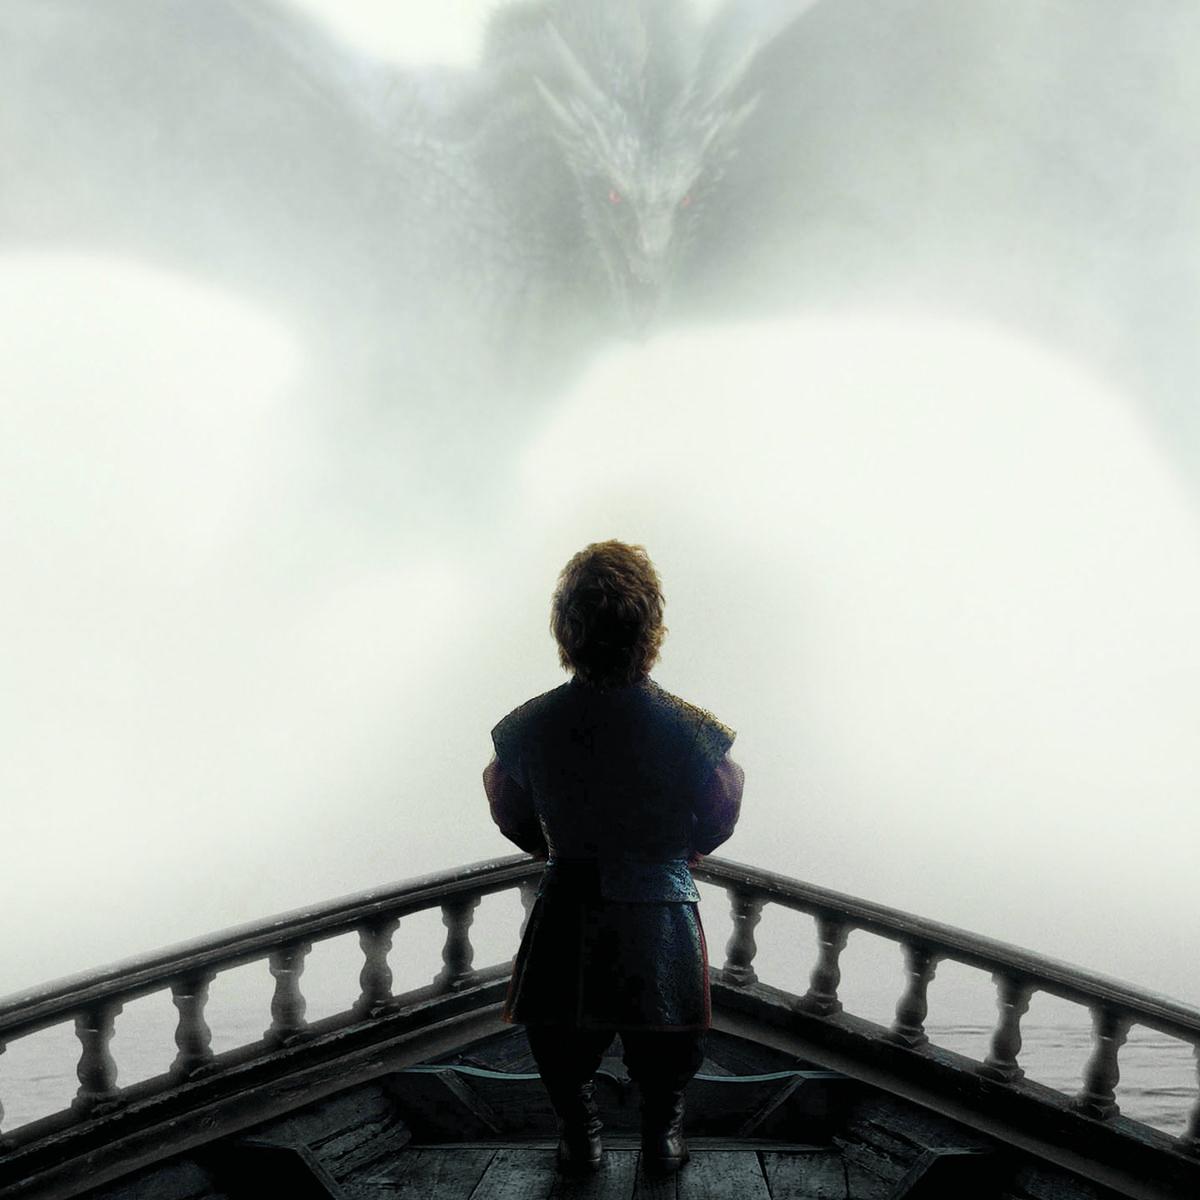 game-thrones-season-5-poster.jpg